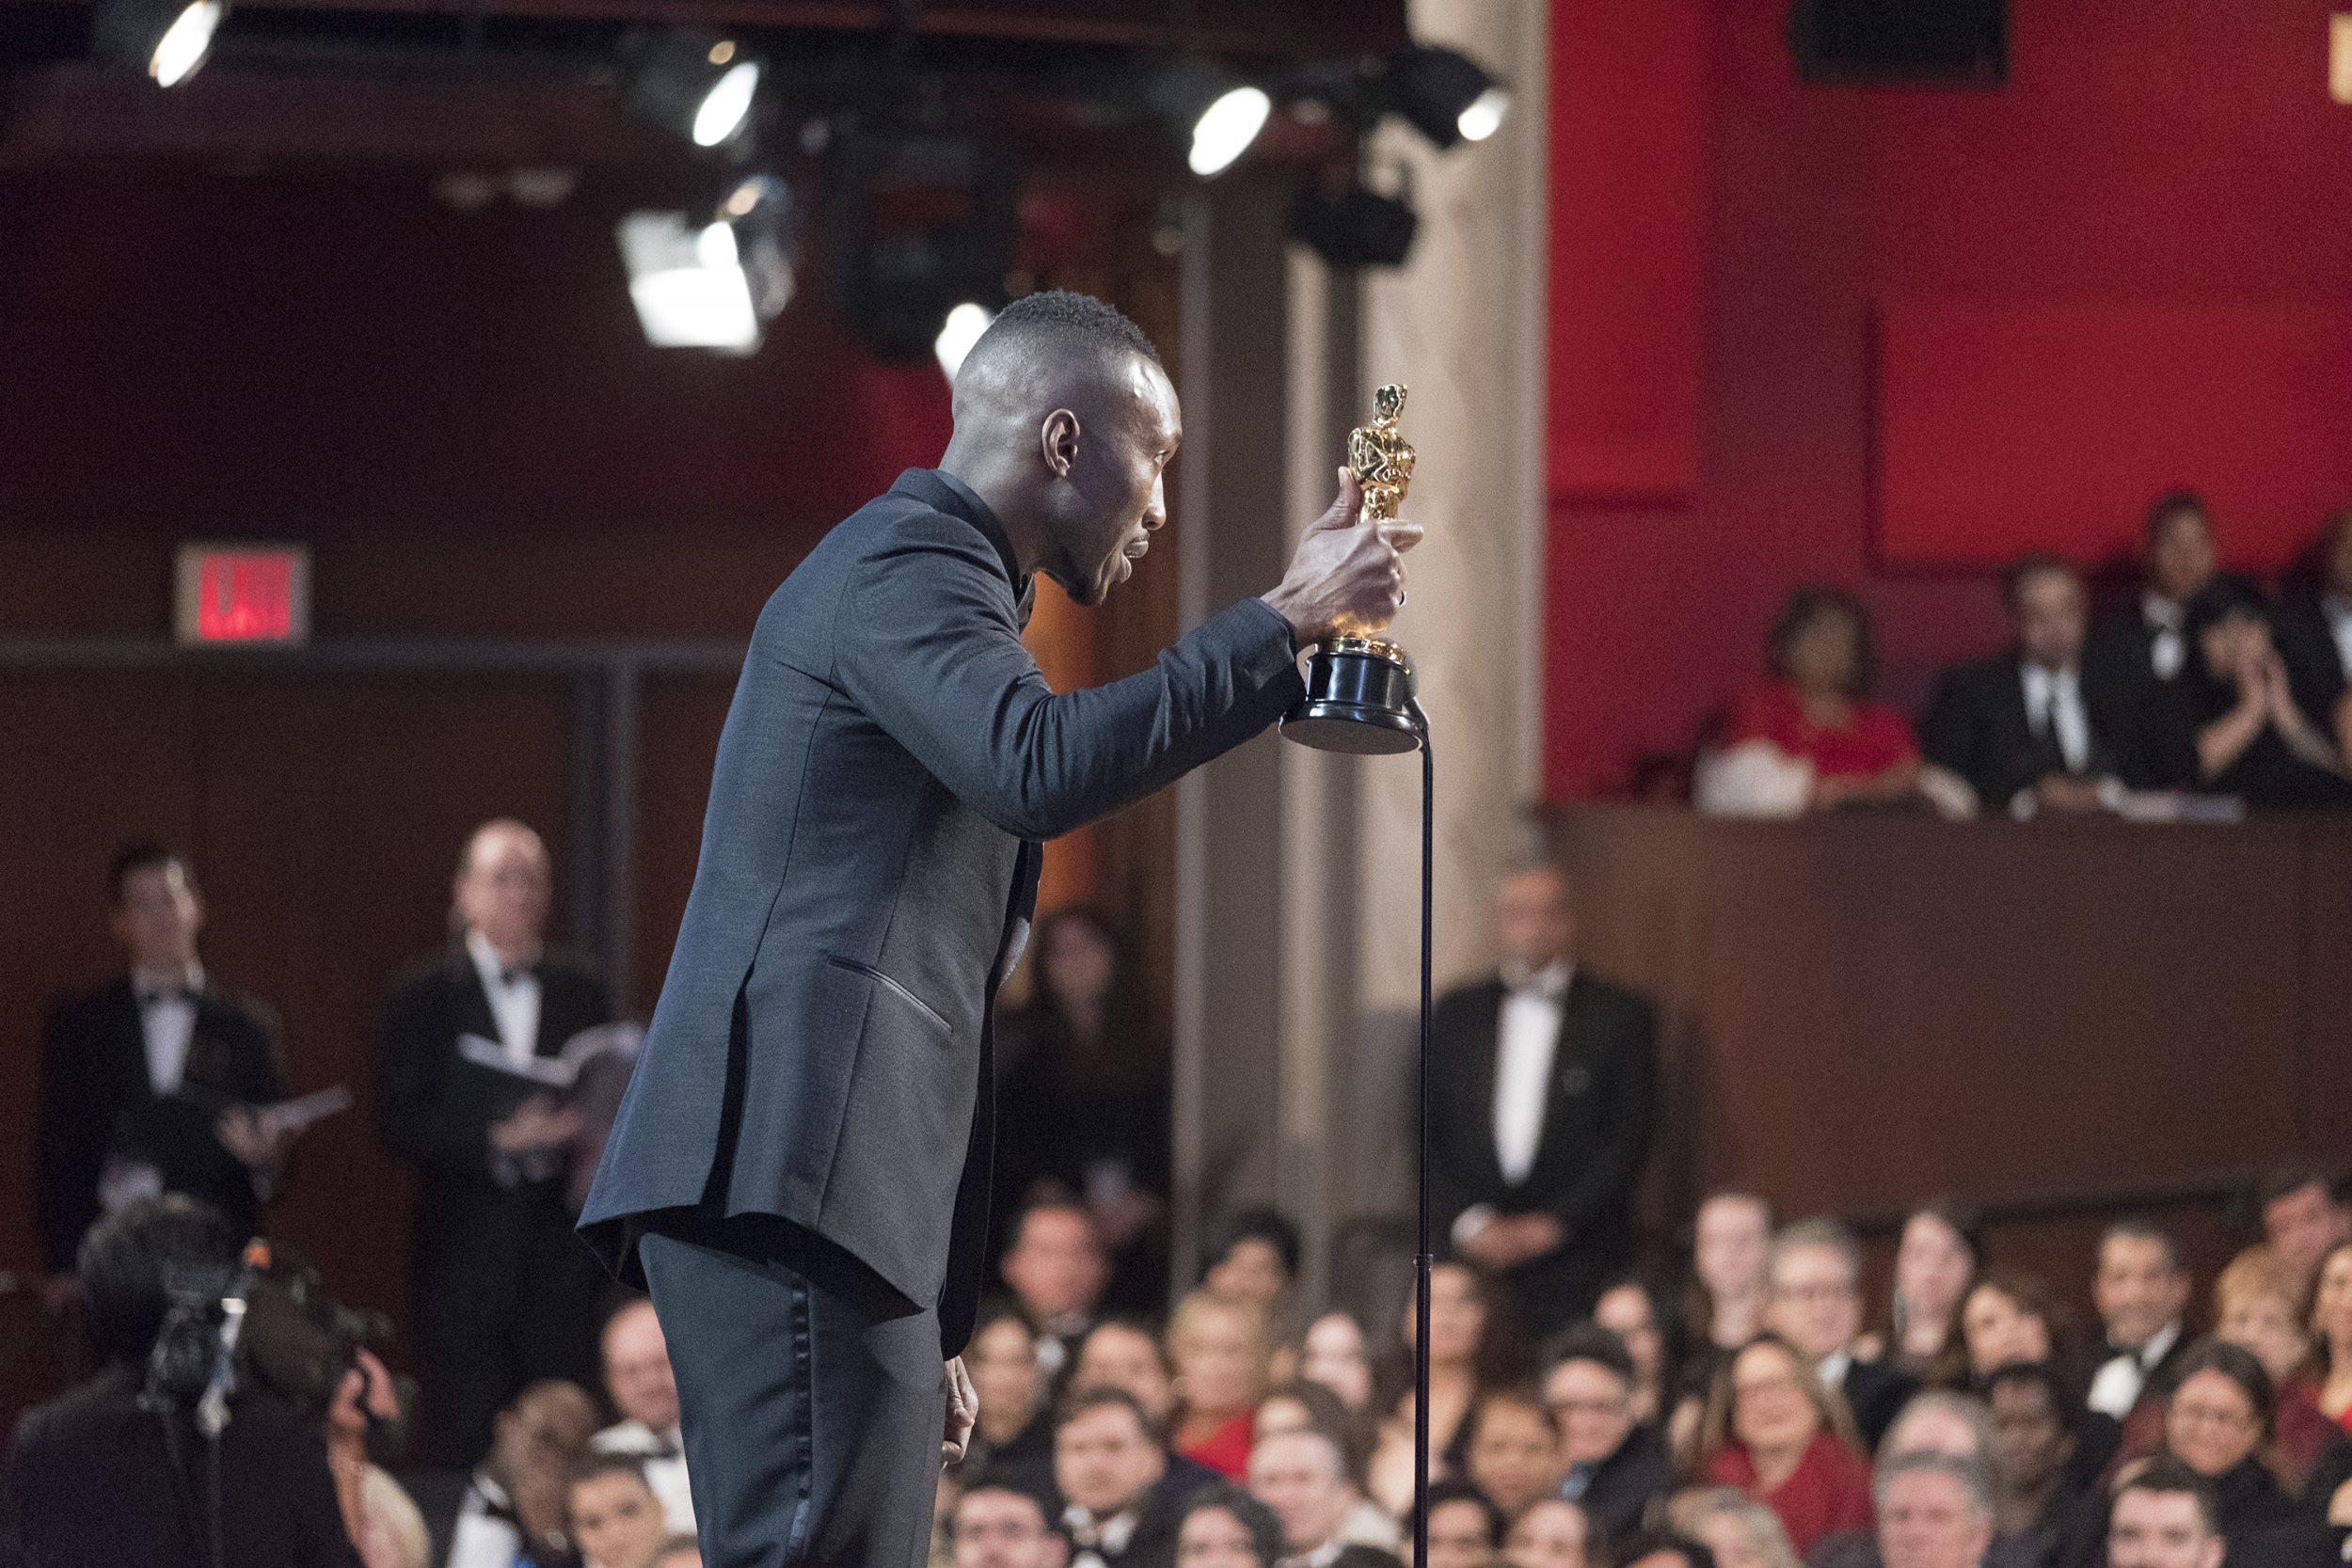 THE OSCARS(r) - The 89th Oscars(r)  broadcasts live on Oscar(r) SUNDAY, FEBRUARY 26, 2017, on the ABC Television Network. (ABC/Adam Rose) MAHERSHALA ALI